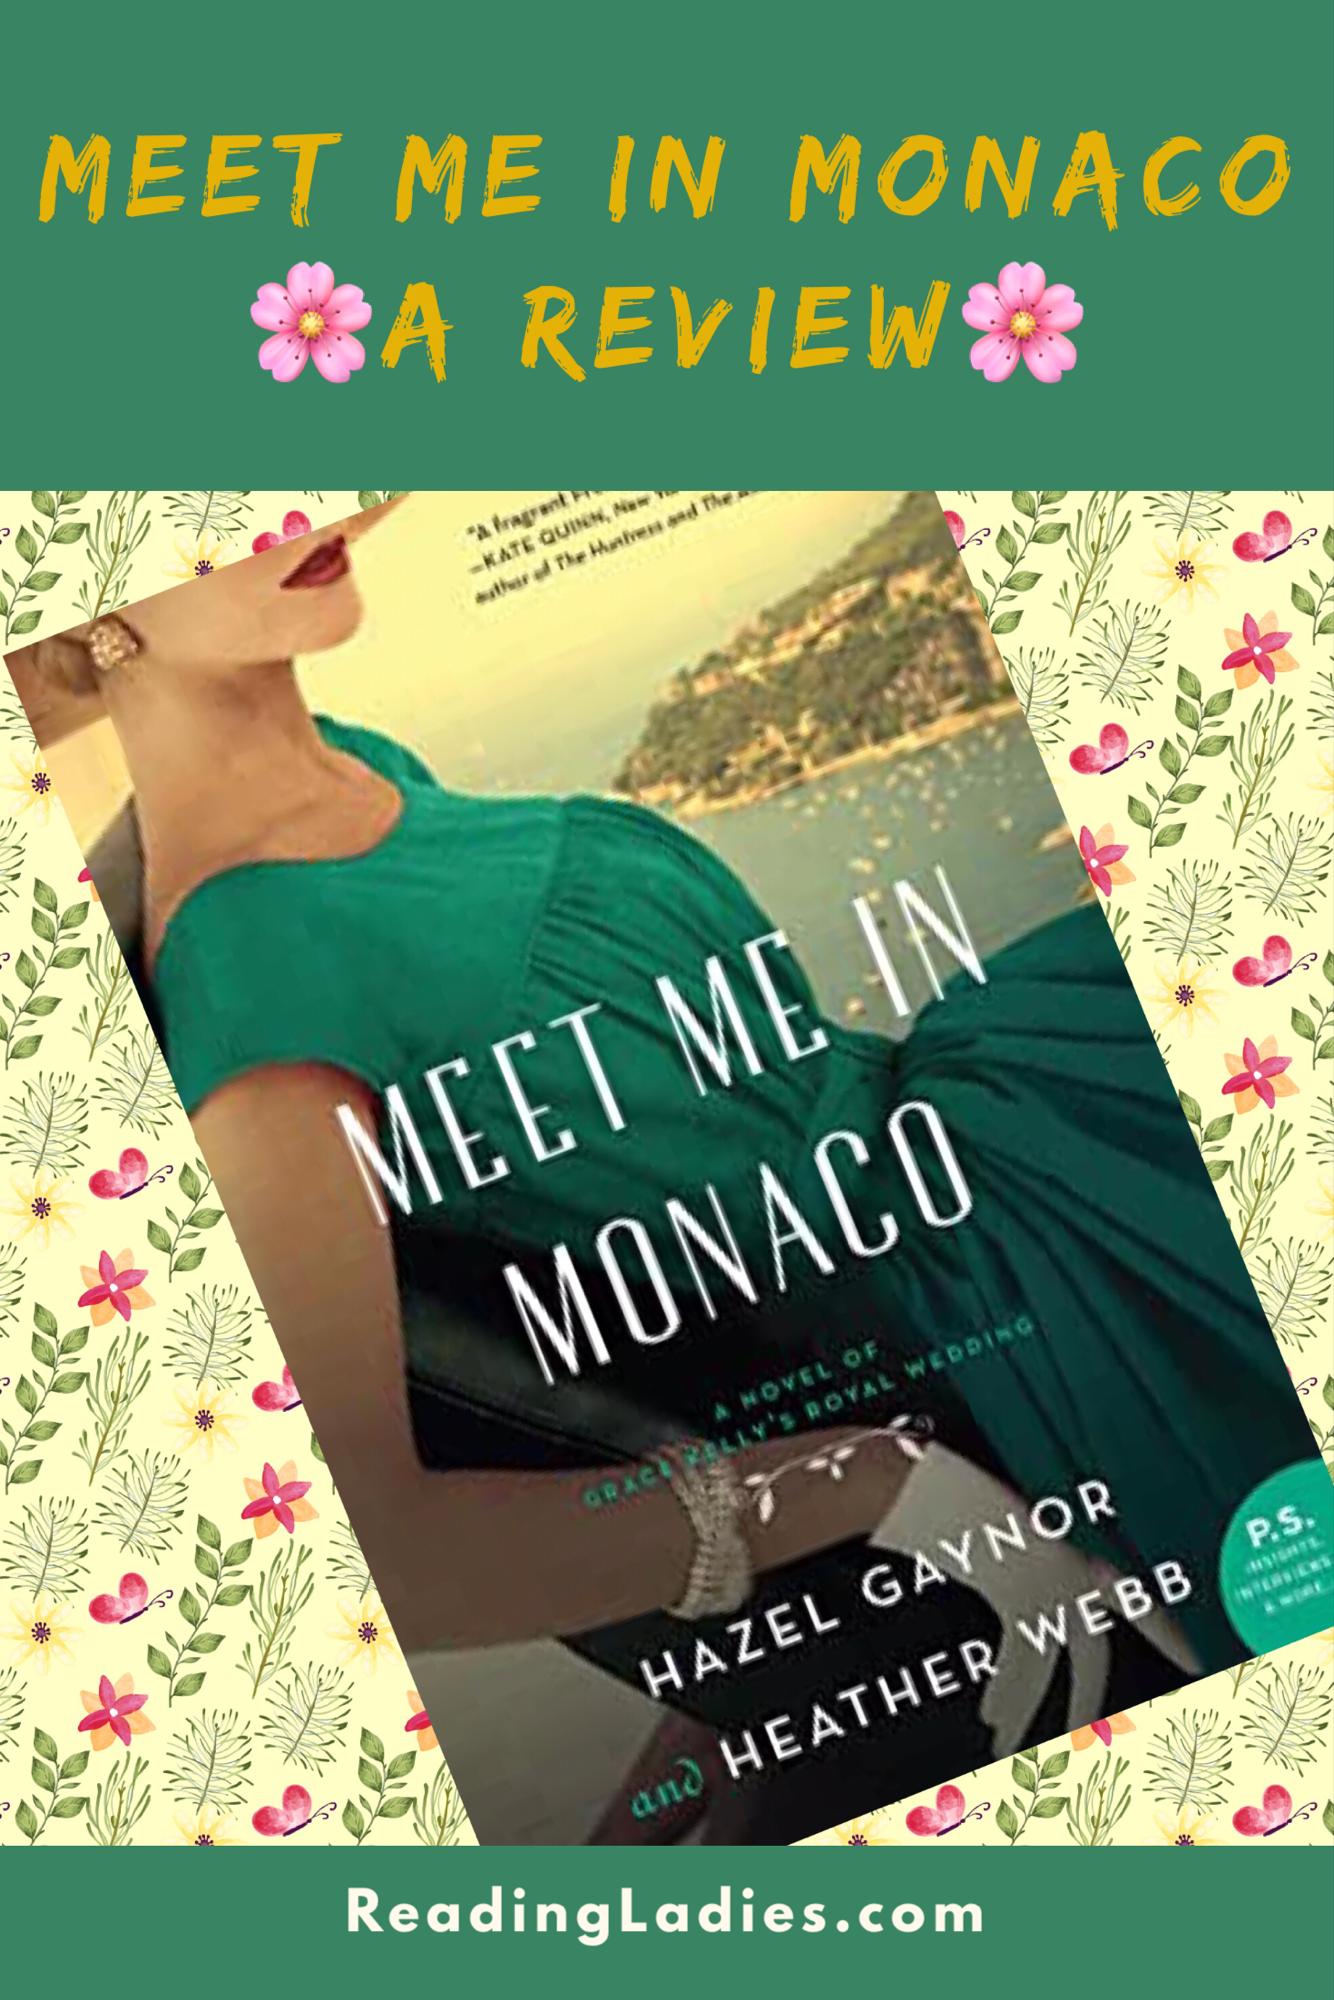 Meet Me in Monaco Review